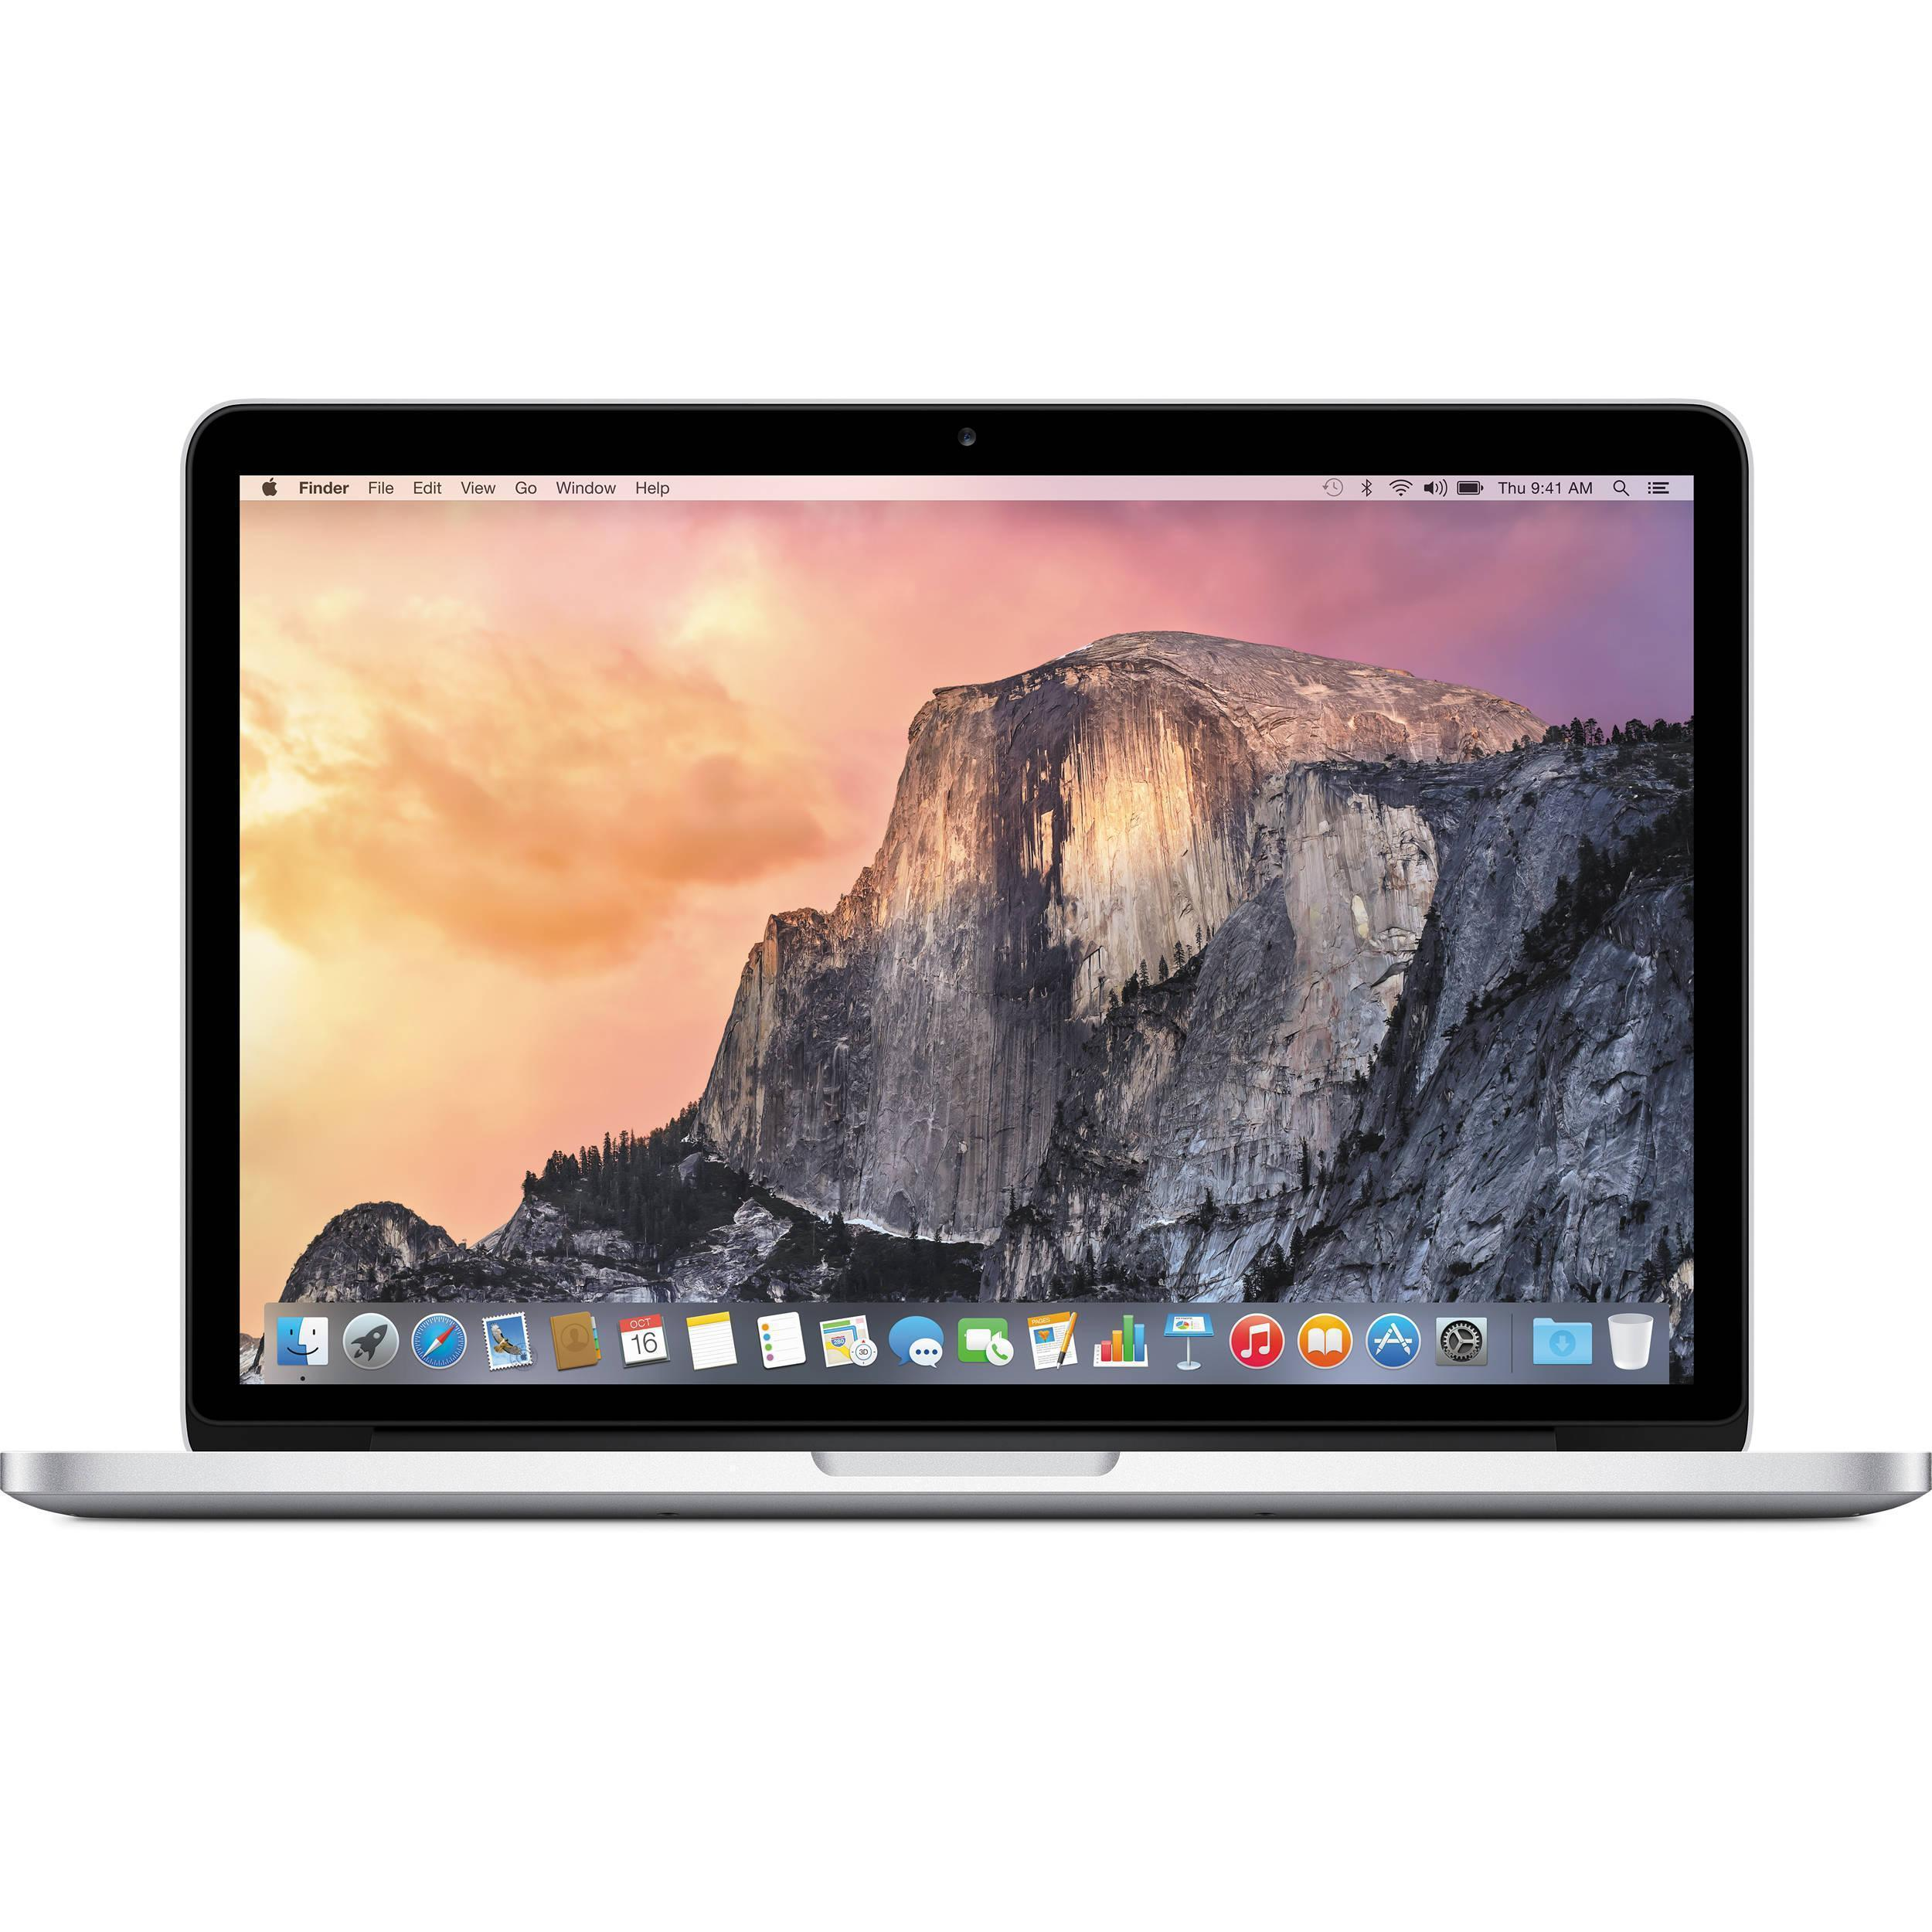 MacBook Pro Retina 13,3-inch (2015) - Core i5 - 8GB - SSD 256 GB QWERTZ - Alemão